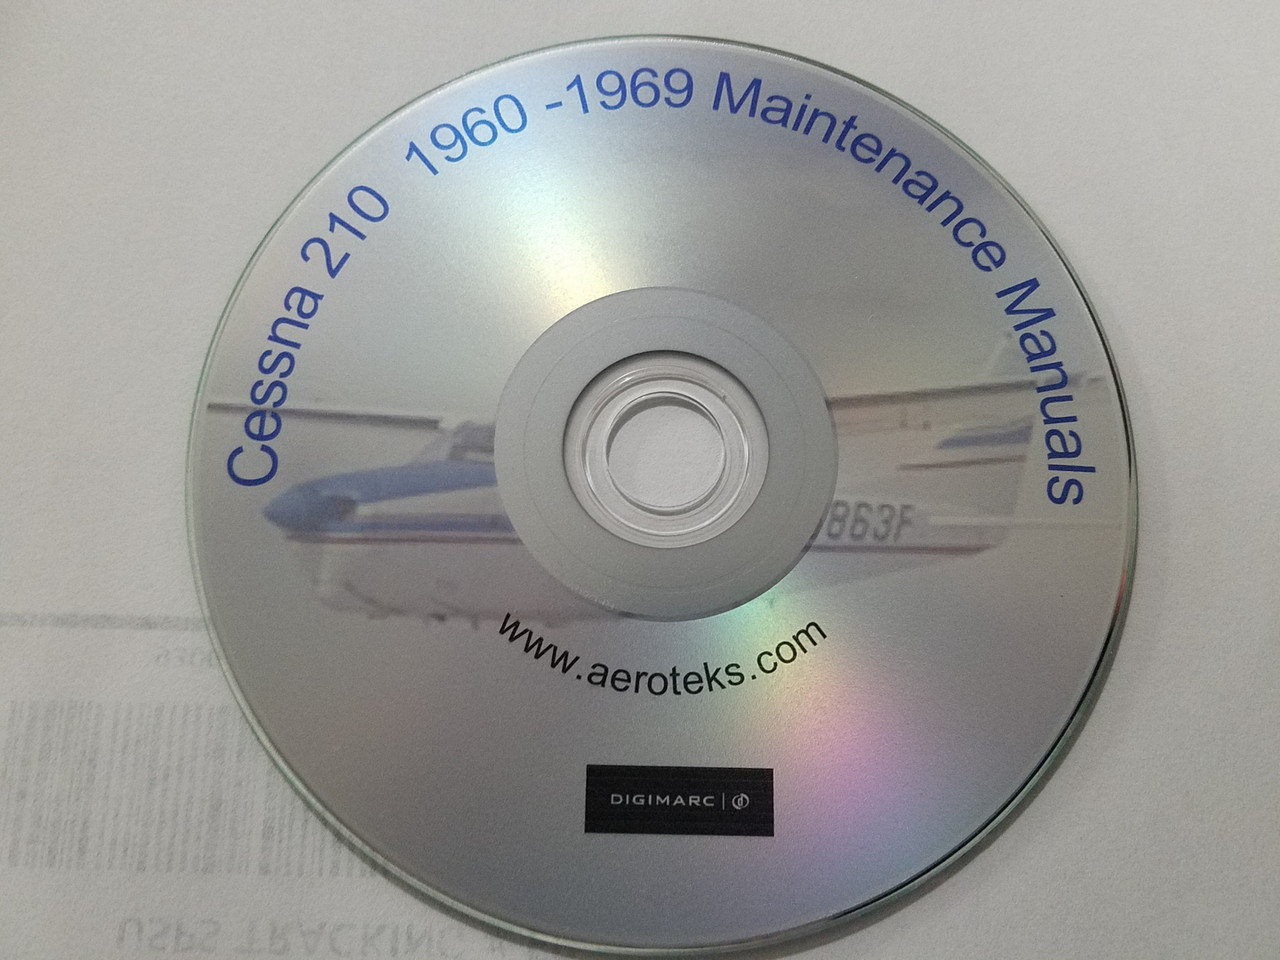 Aircraft Service Maintenance Manuals